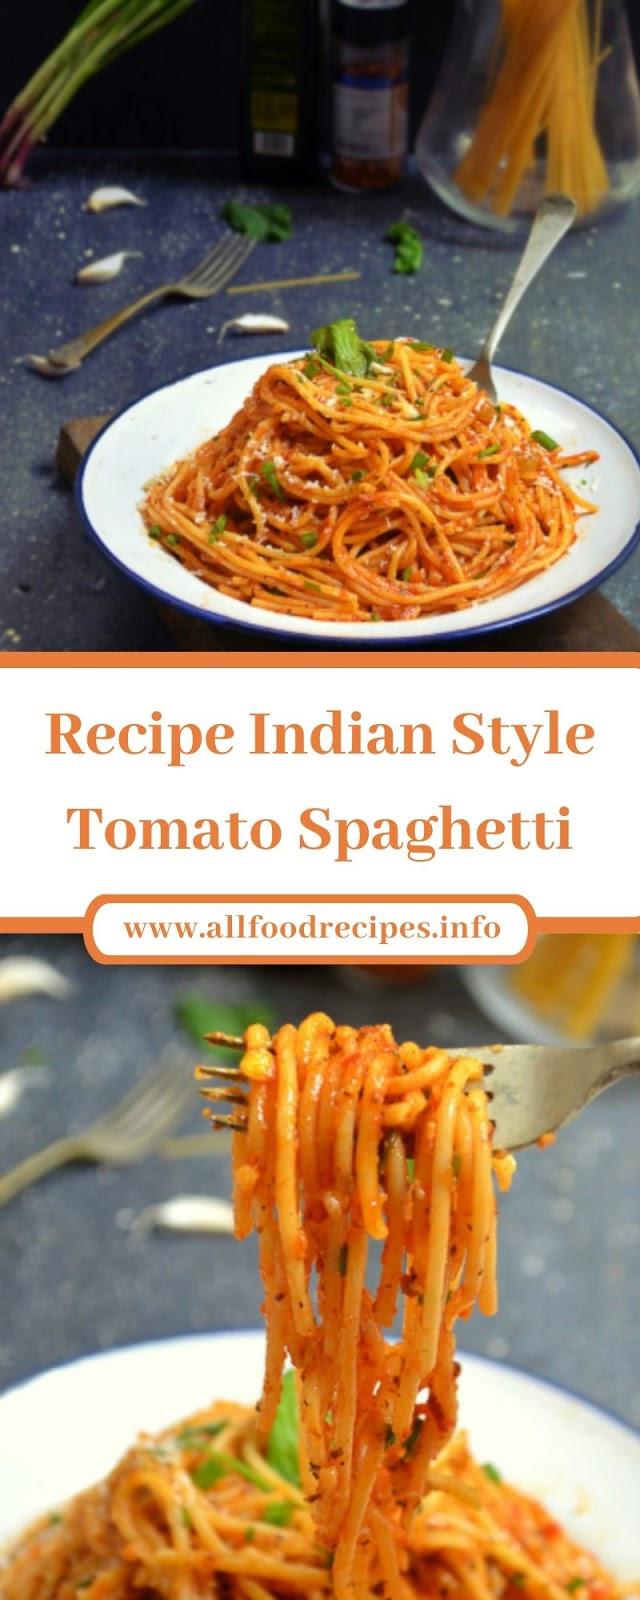 Recipe Indian Style Tomato Spaghetti